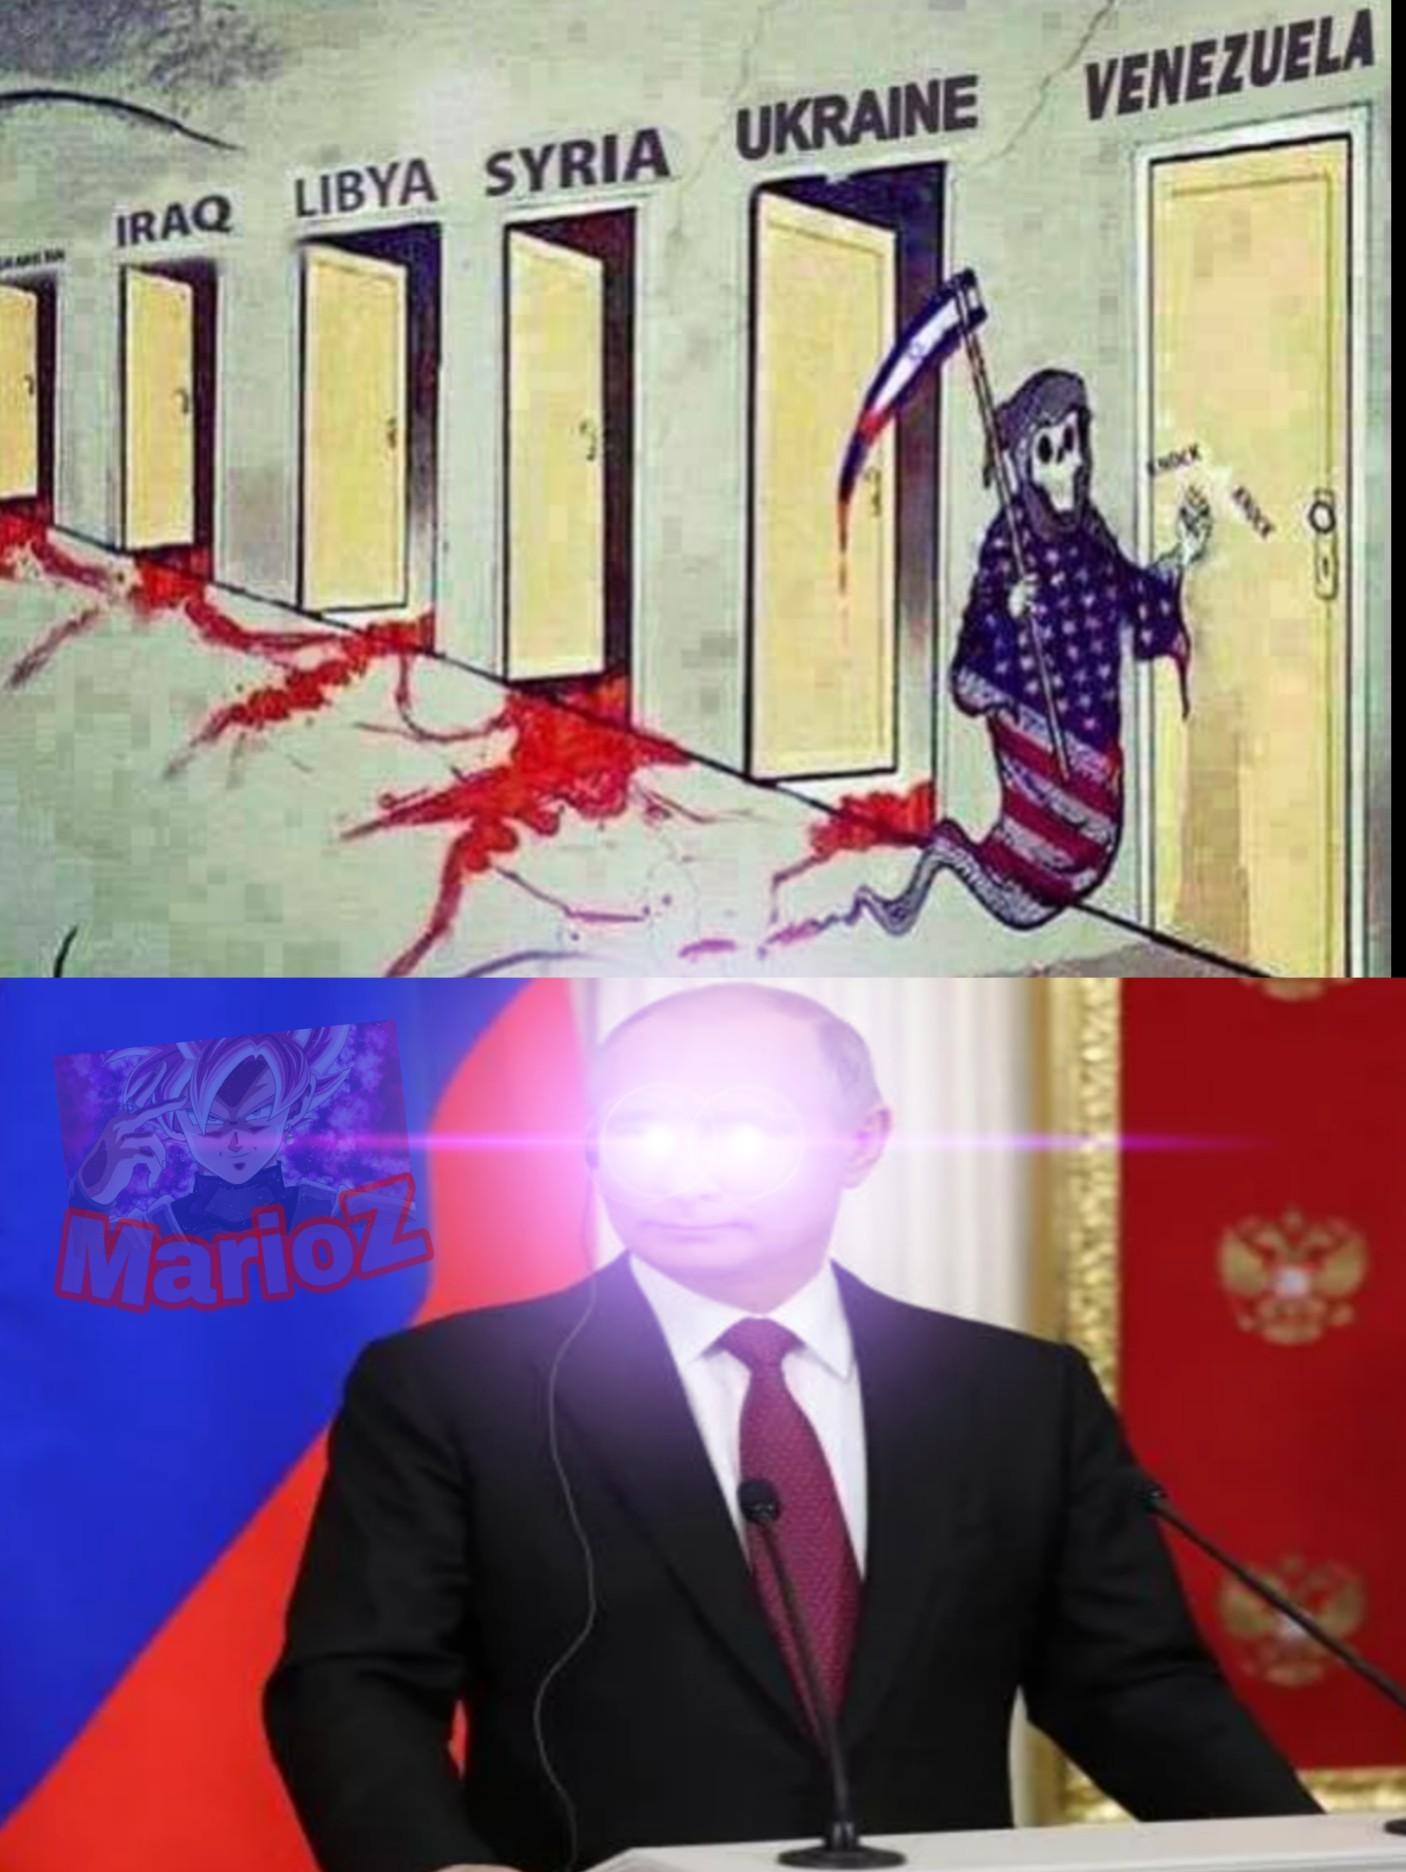 Putin se va a enojar - meme